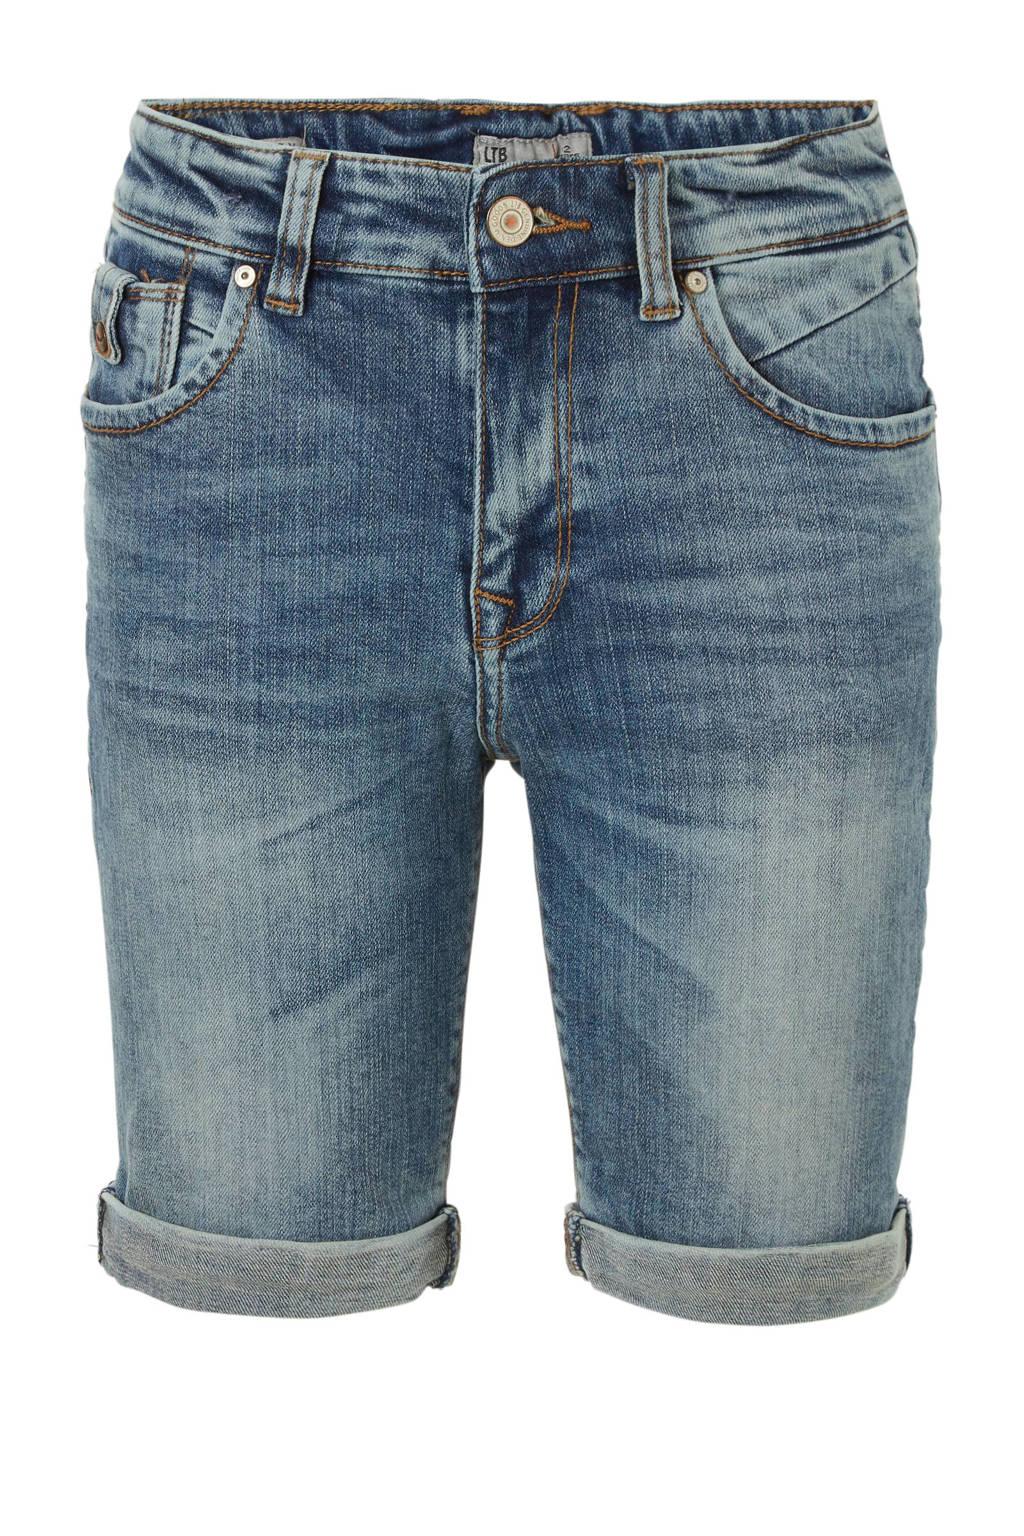 LTB jeans bermuda Anders X, Laredo wash